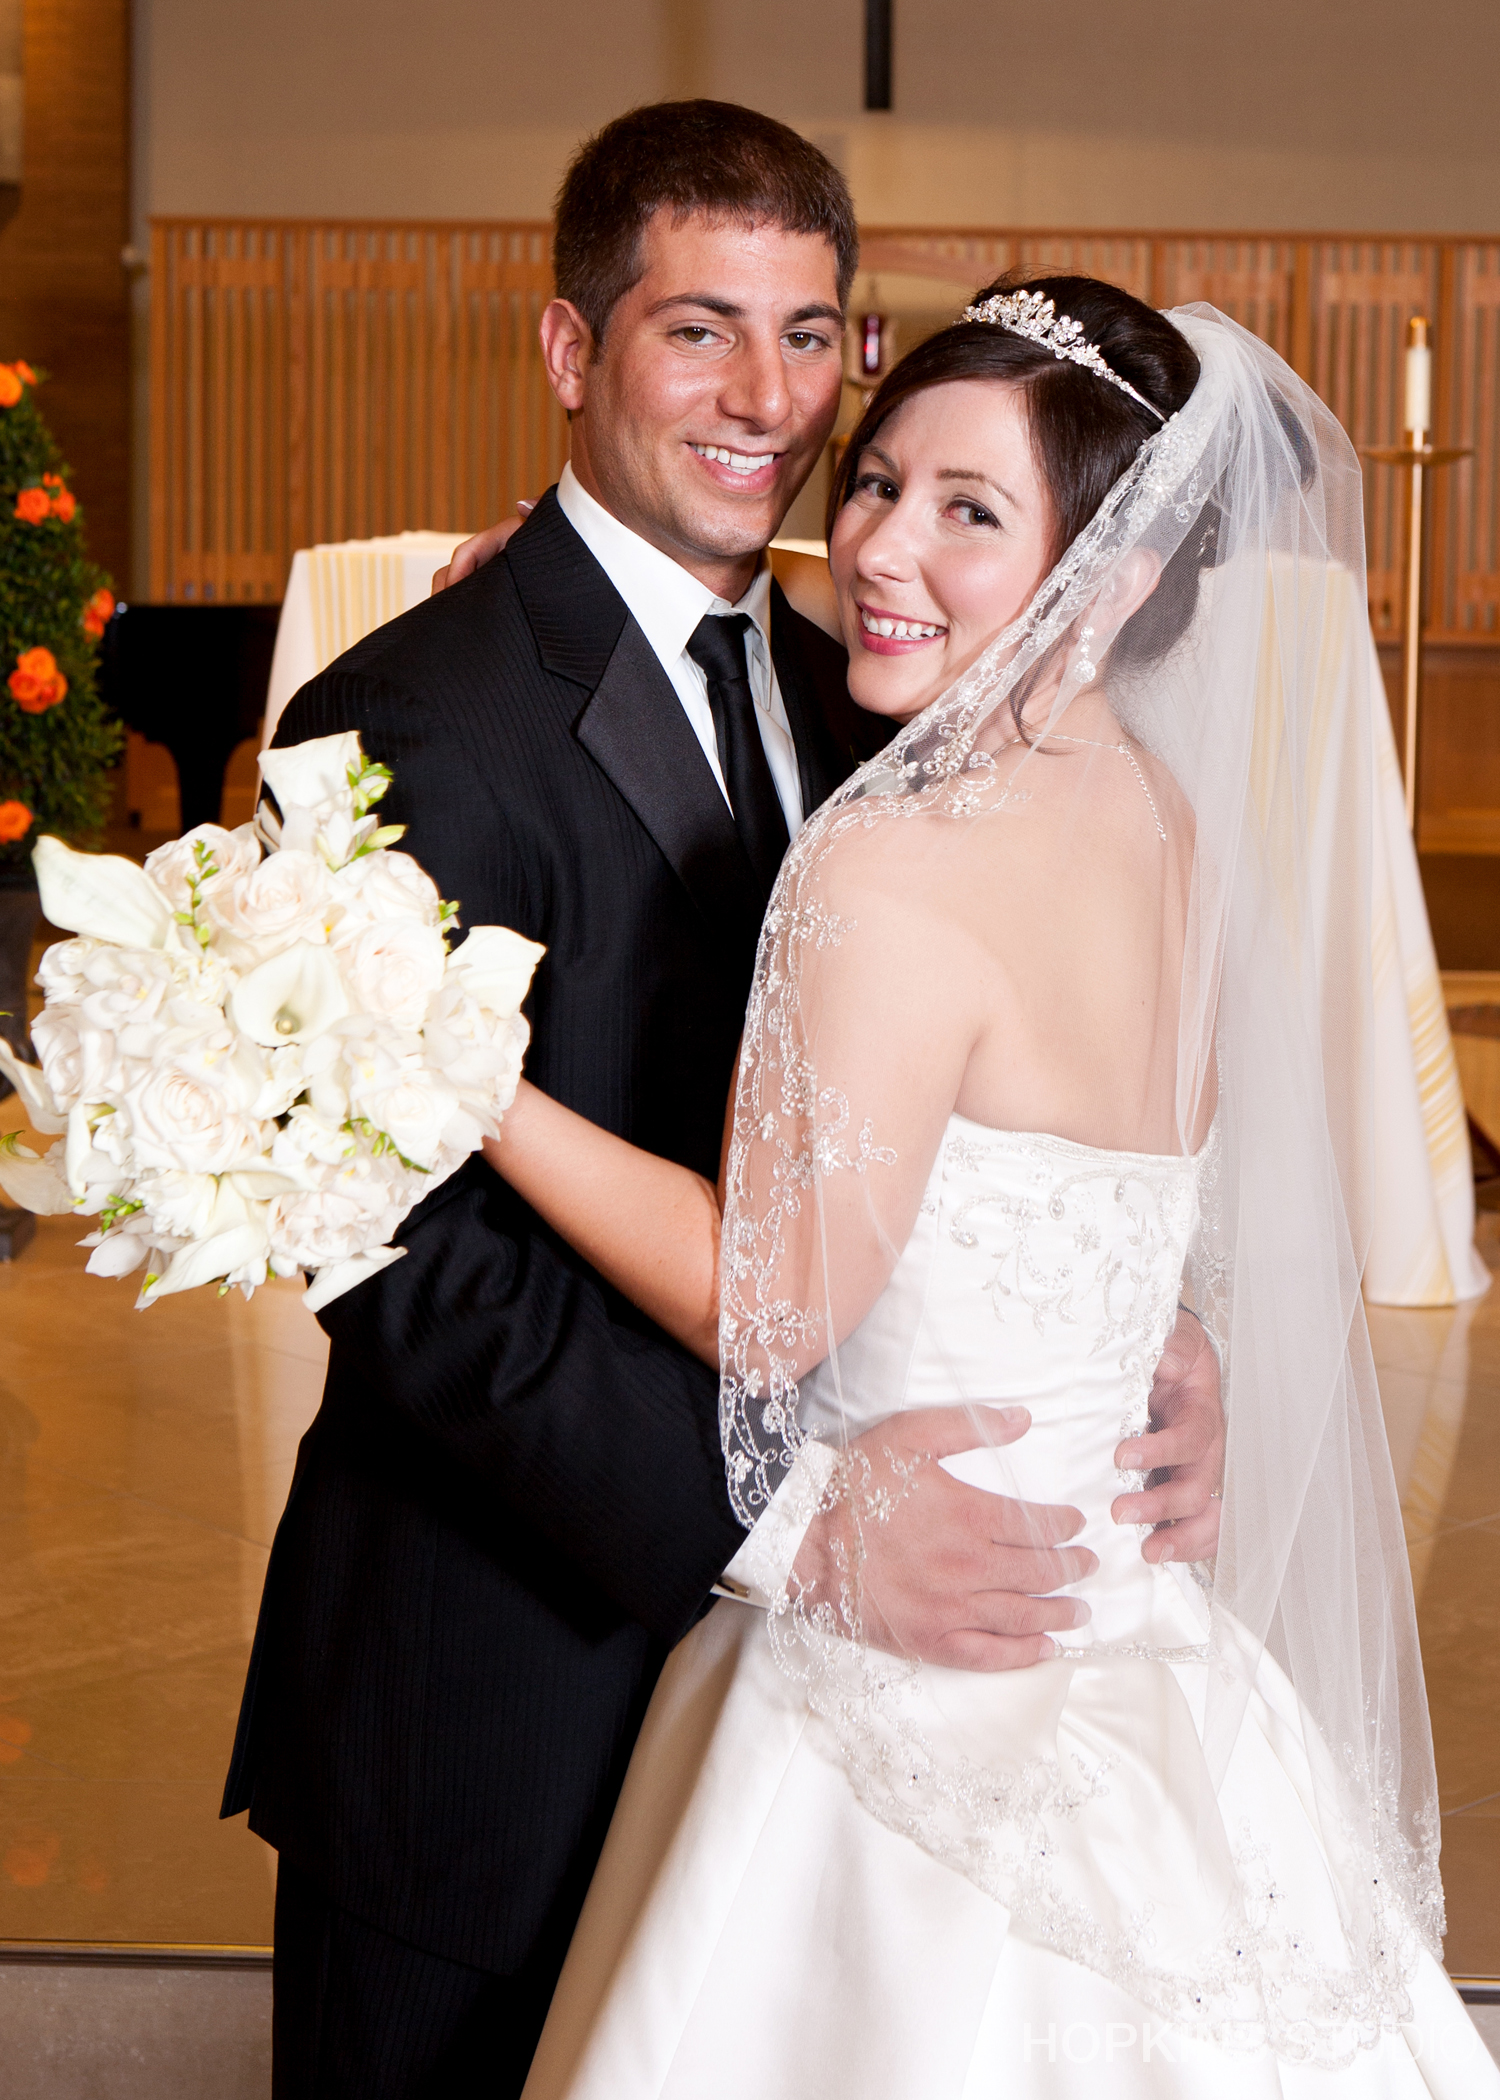 wedding-photography-Windsor-Park-Conference-Center-South-Bend-Indiana_23.jpg